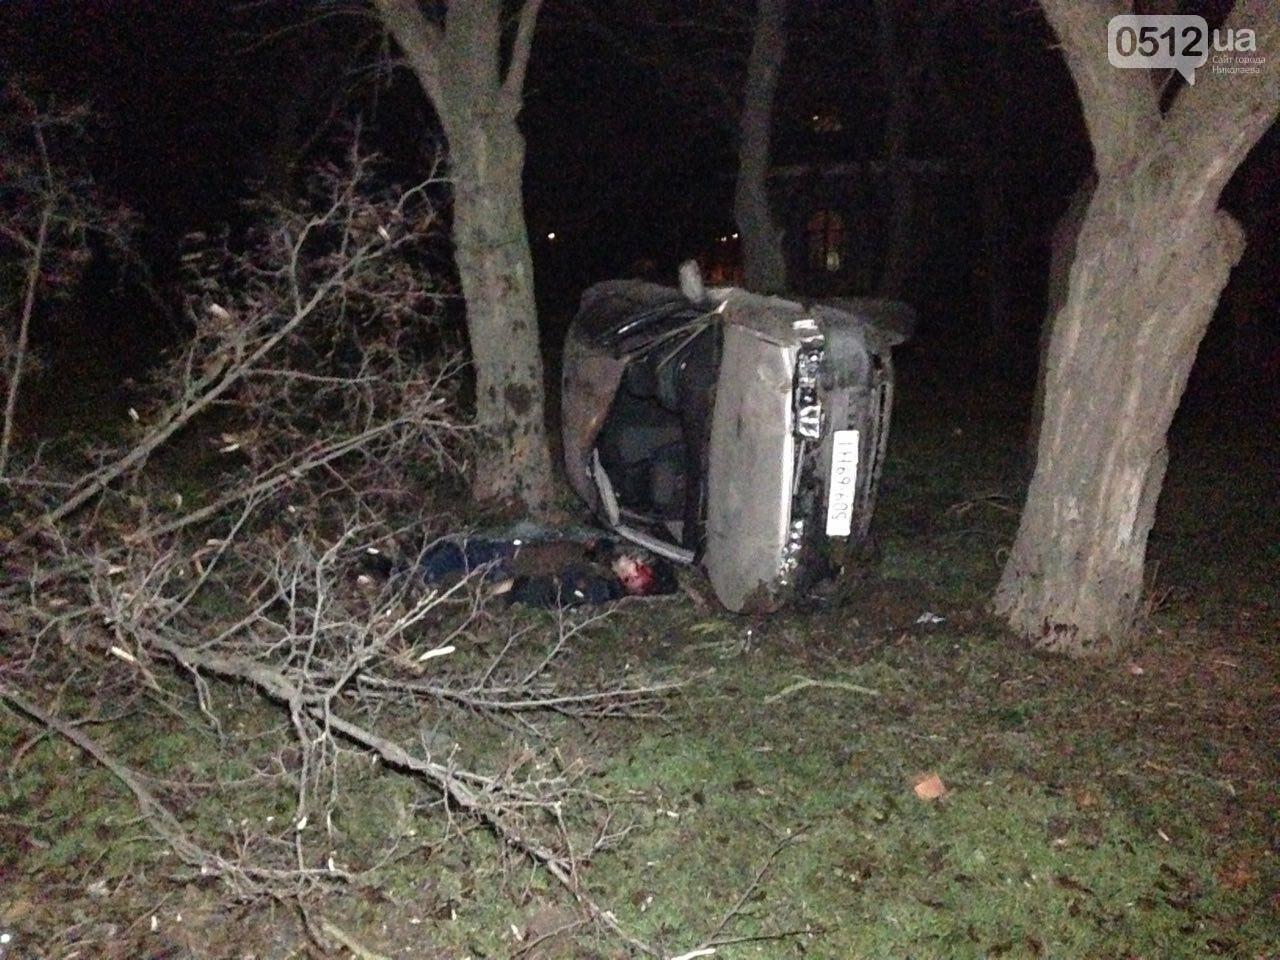 Страшное ДТП в Николаеве: 2 парня и 2 девушки на Мазде влетели в дерево - водитель умер на месте аварии, - ФОТО, фото-6